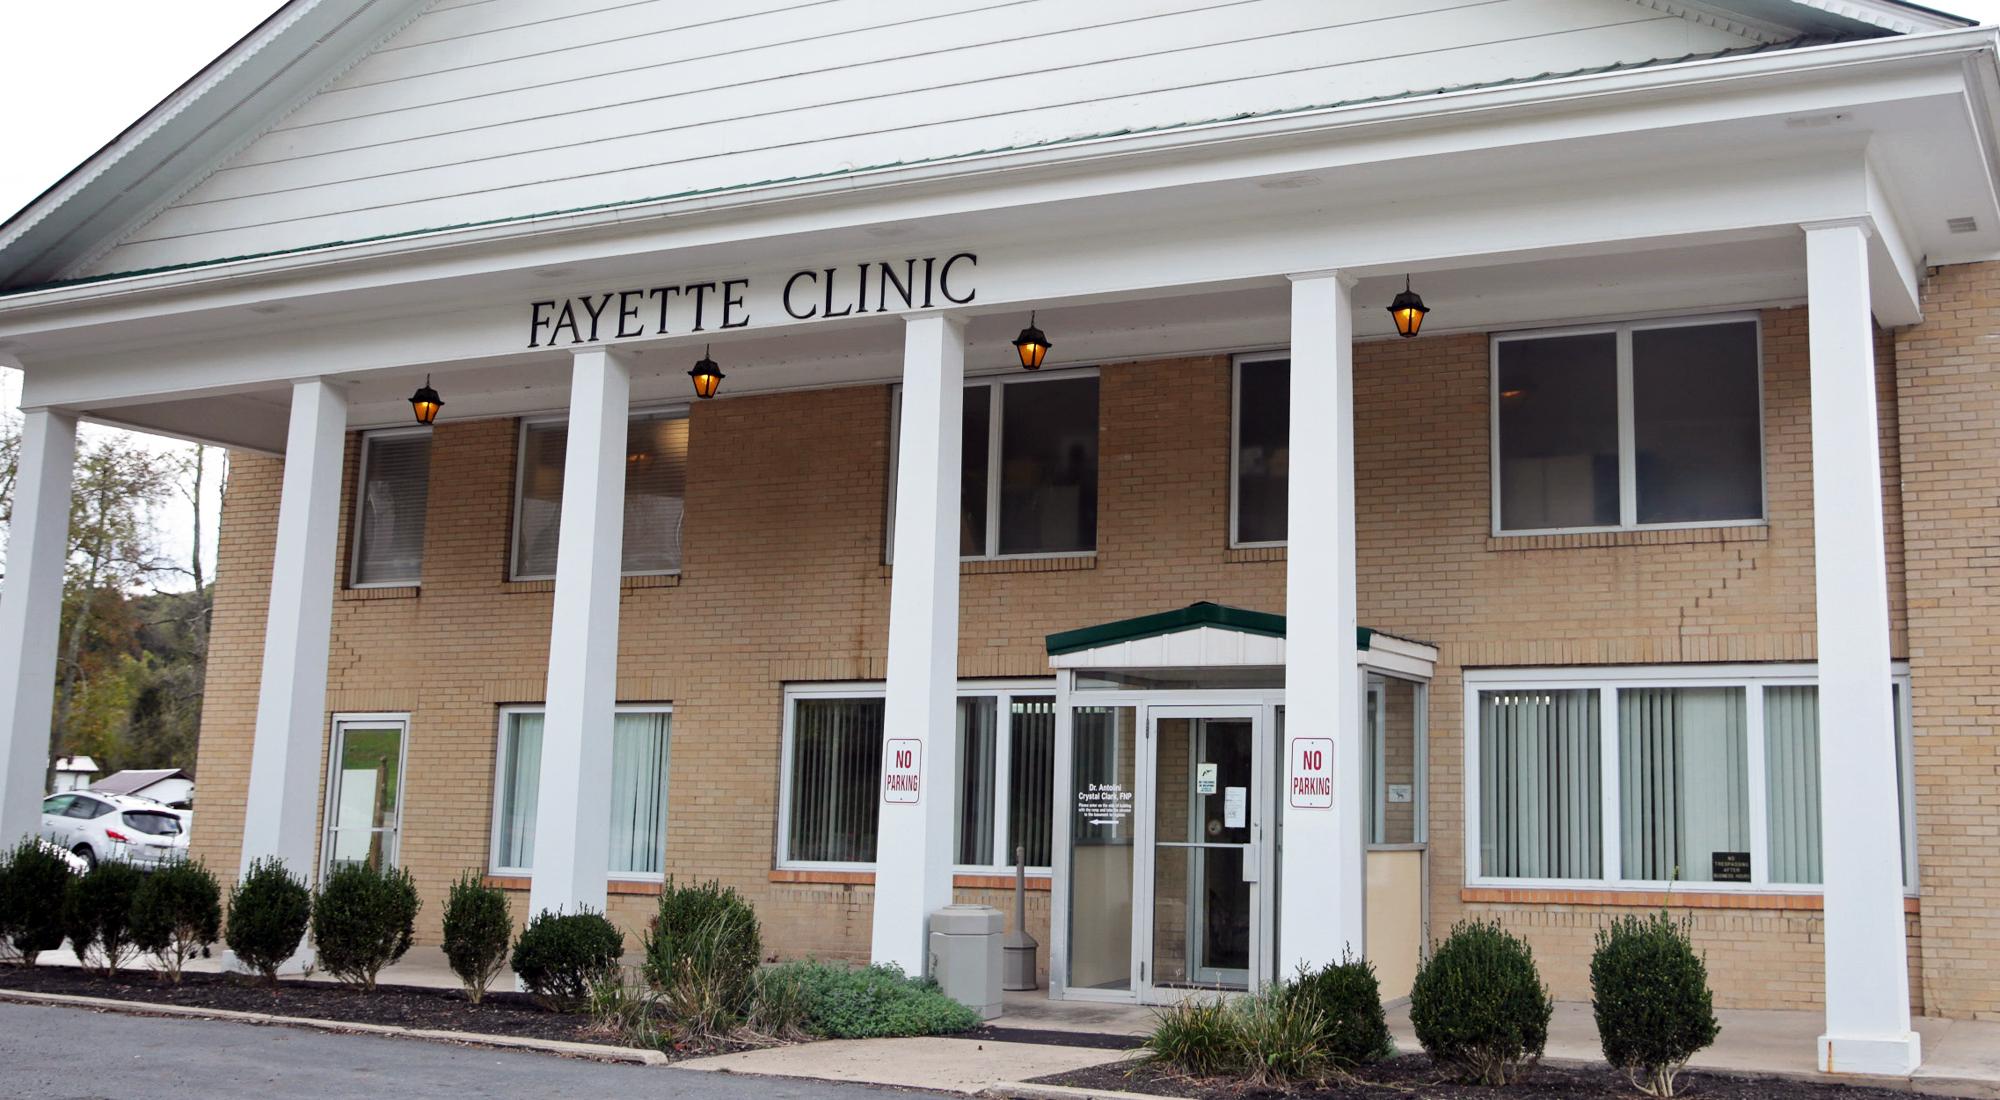 Fayette Clinic